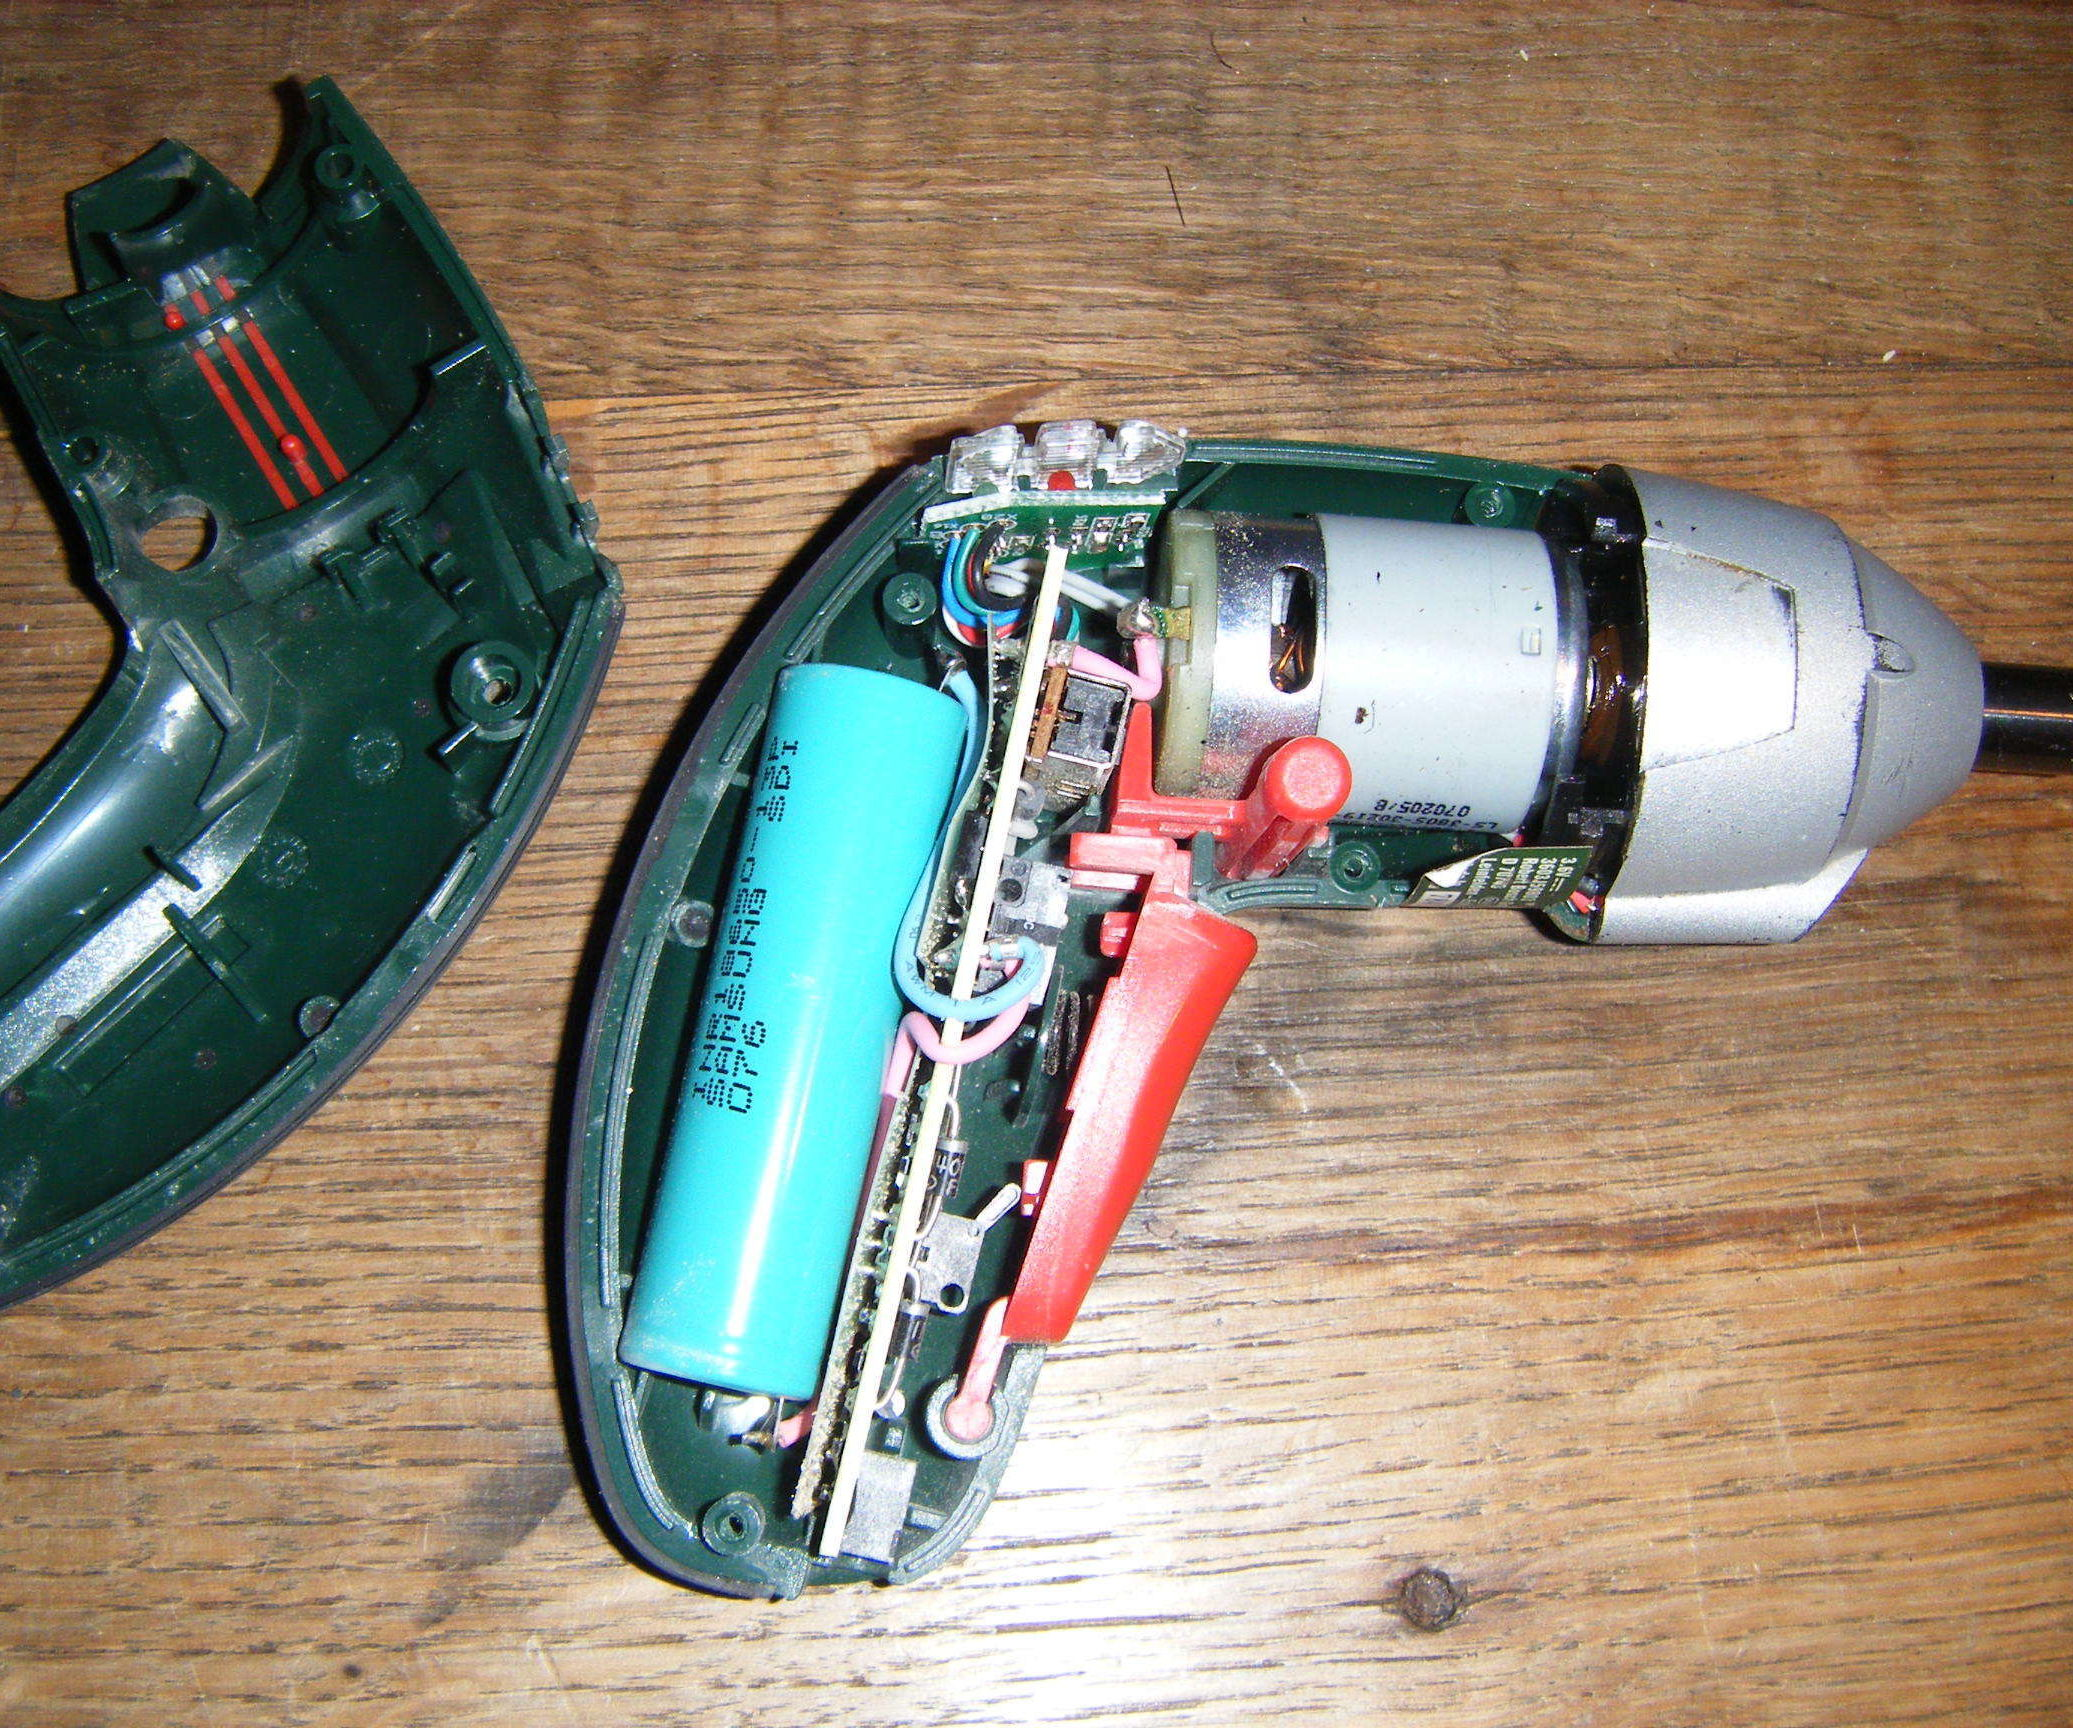 Replacing Battery of IXO Screwdriver